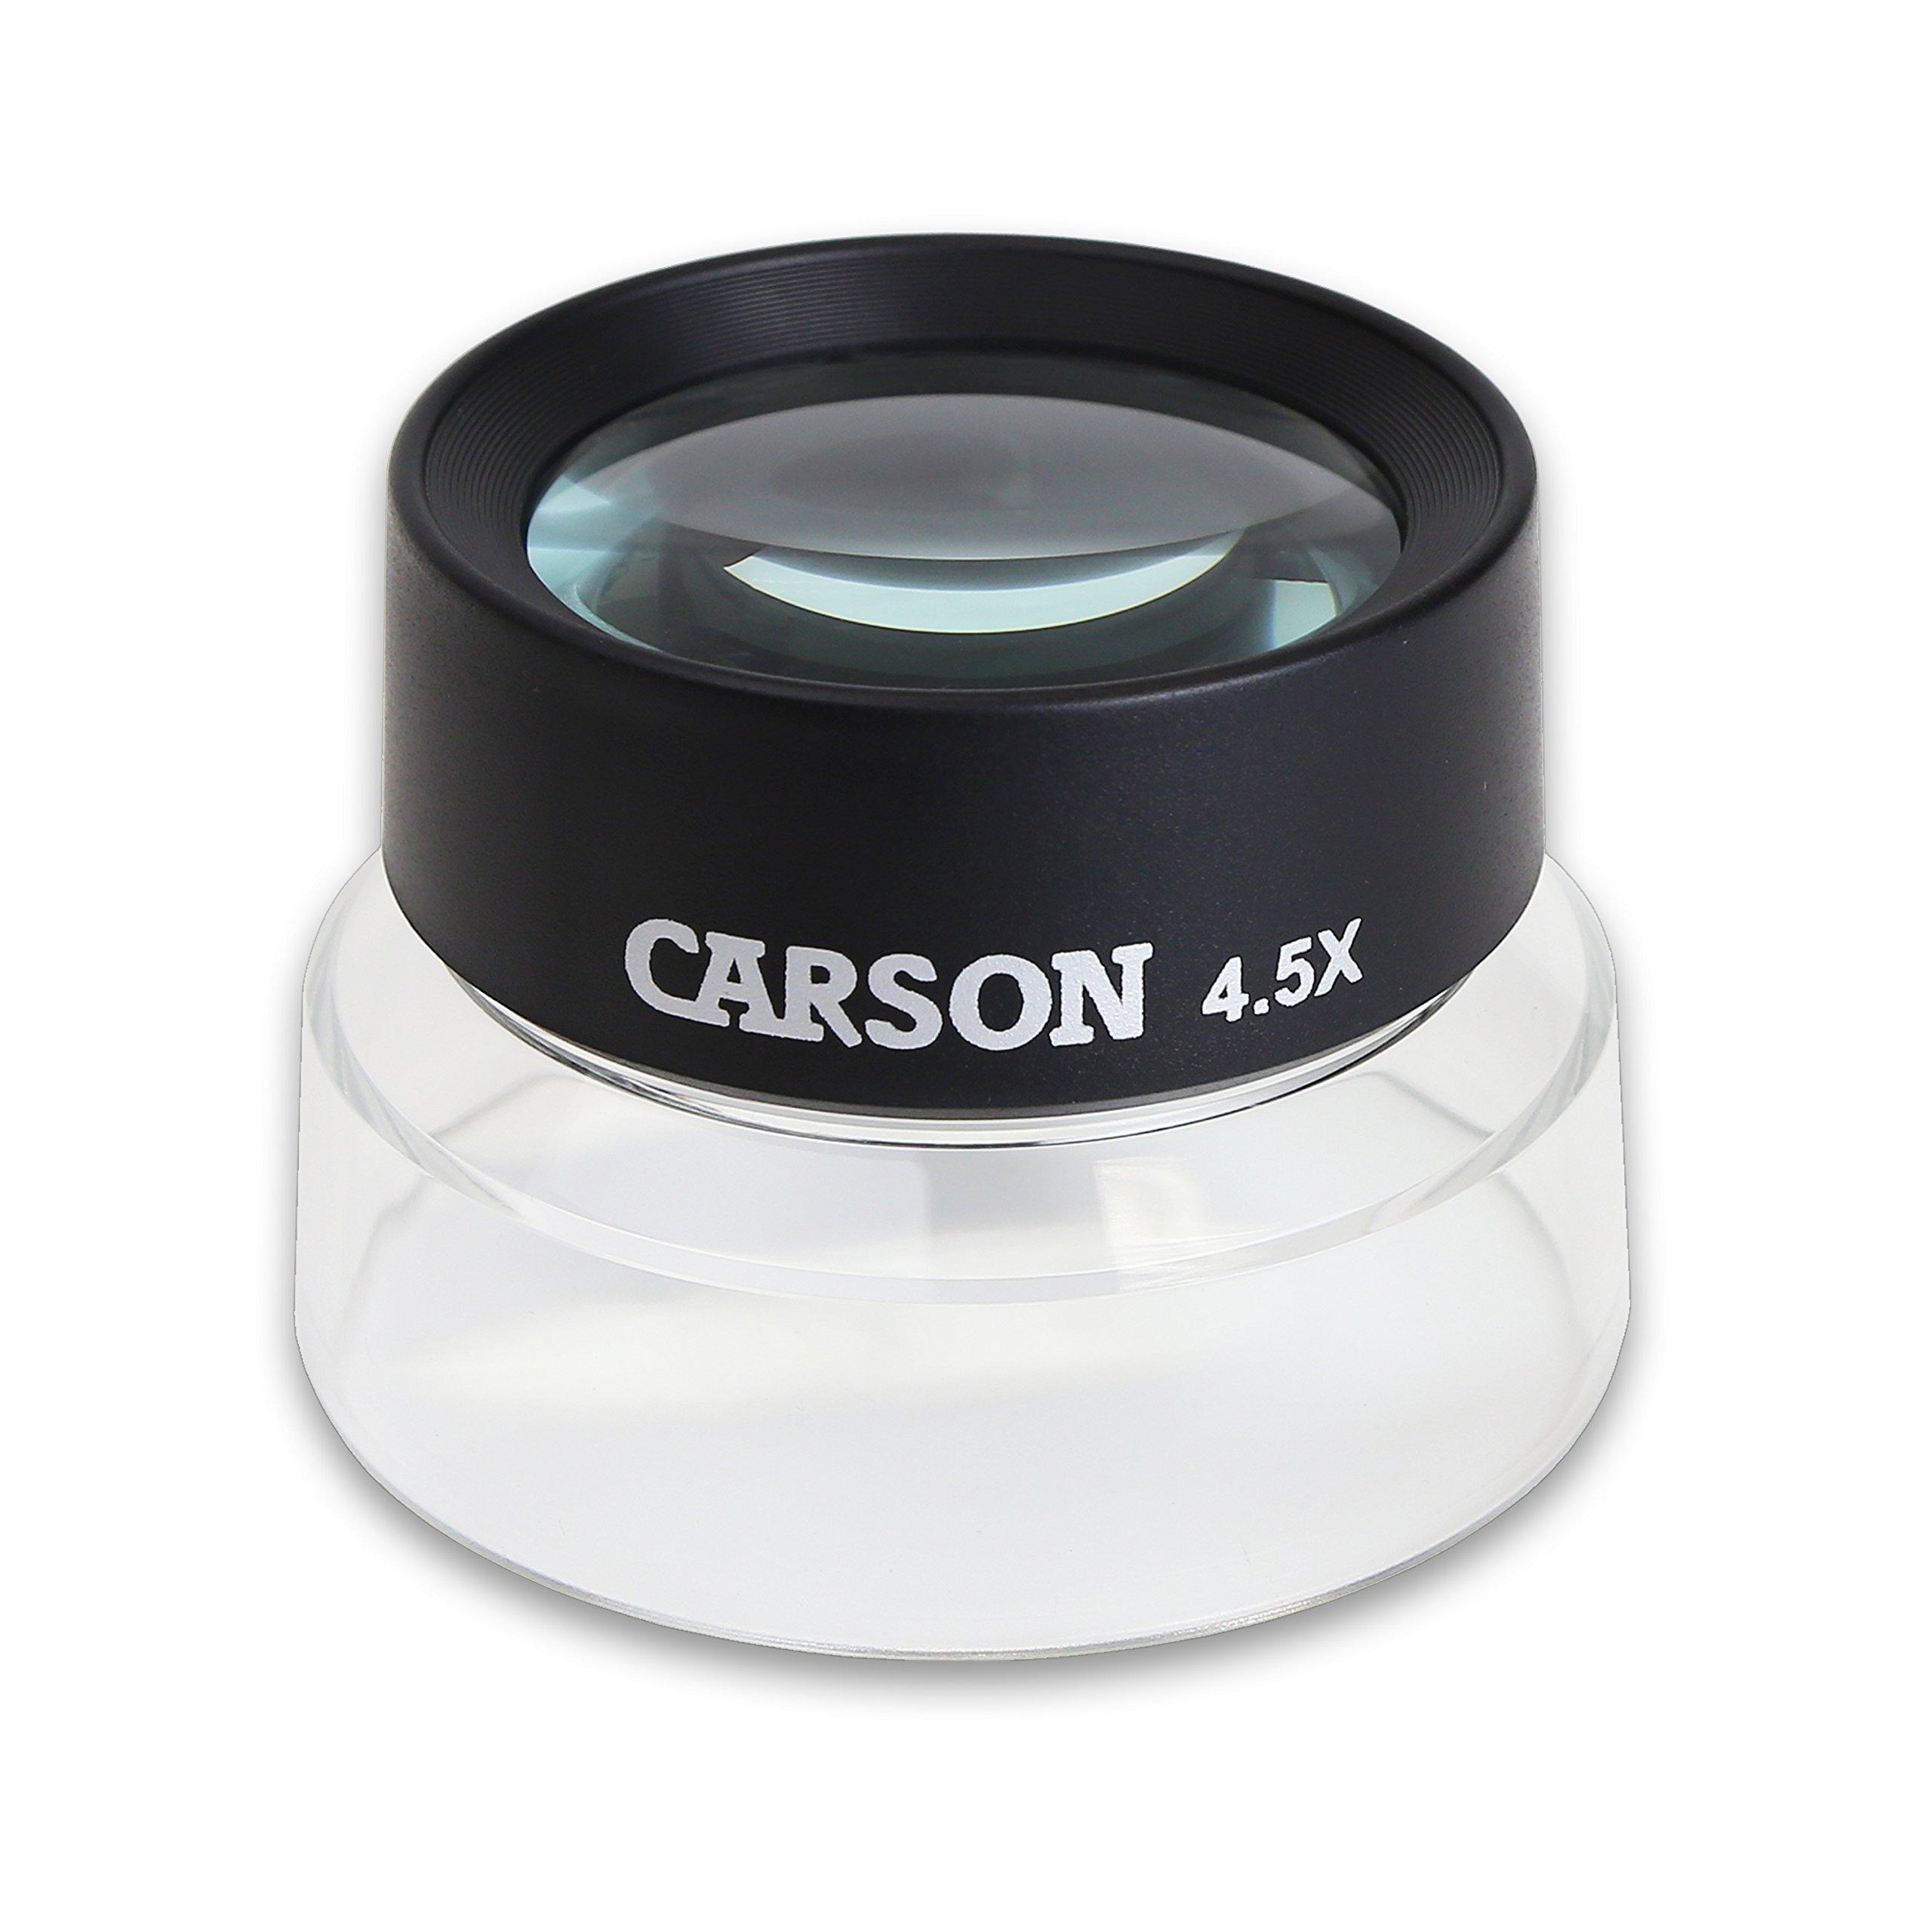 Carson LumiLoupe 4.5X Pre-Focused Stand Magnifier (LL-55)